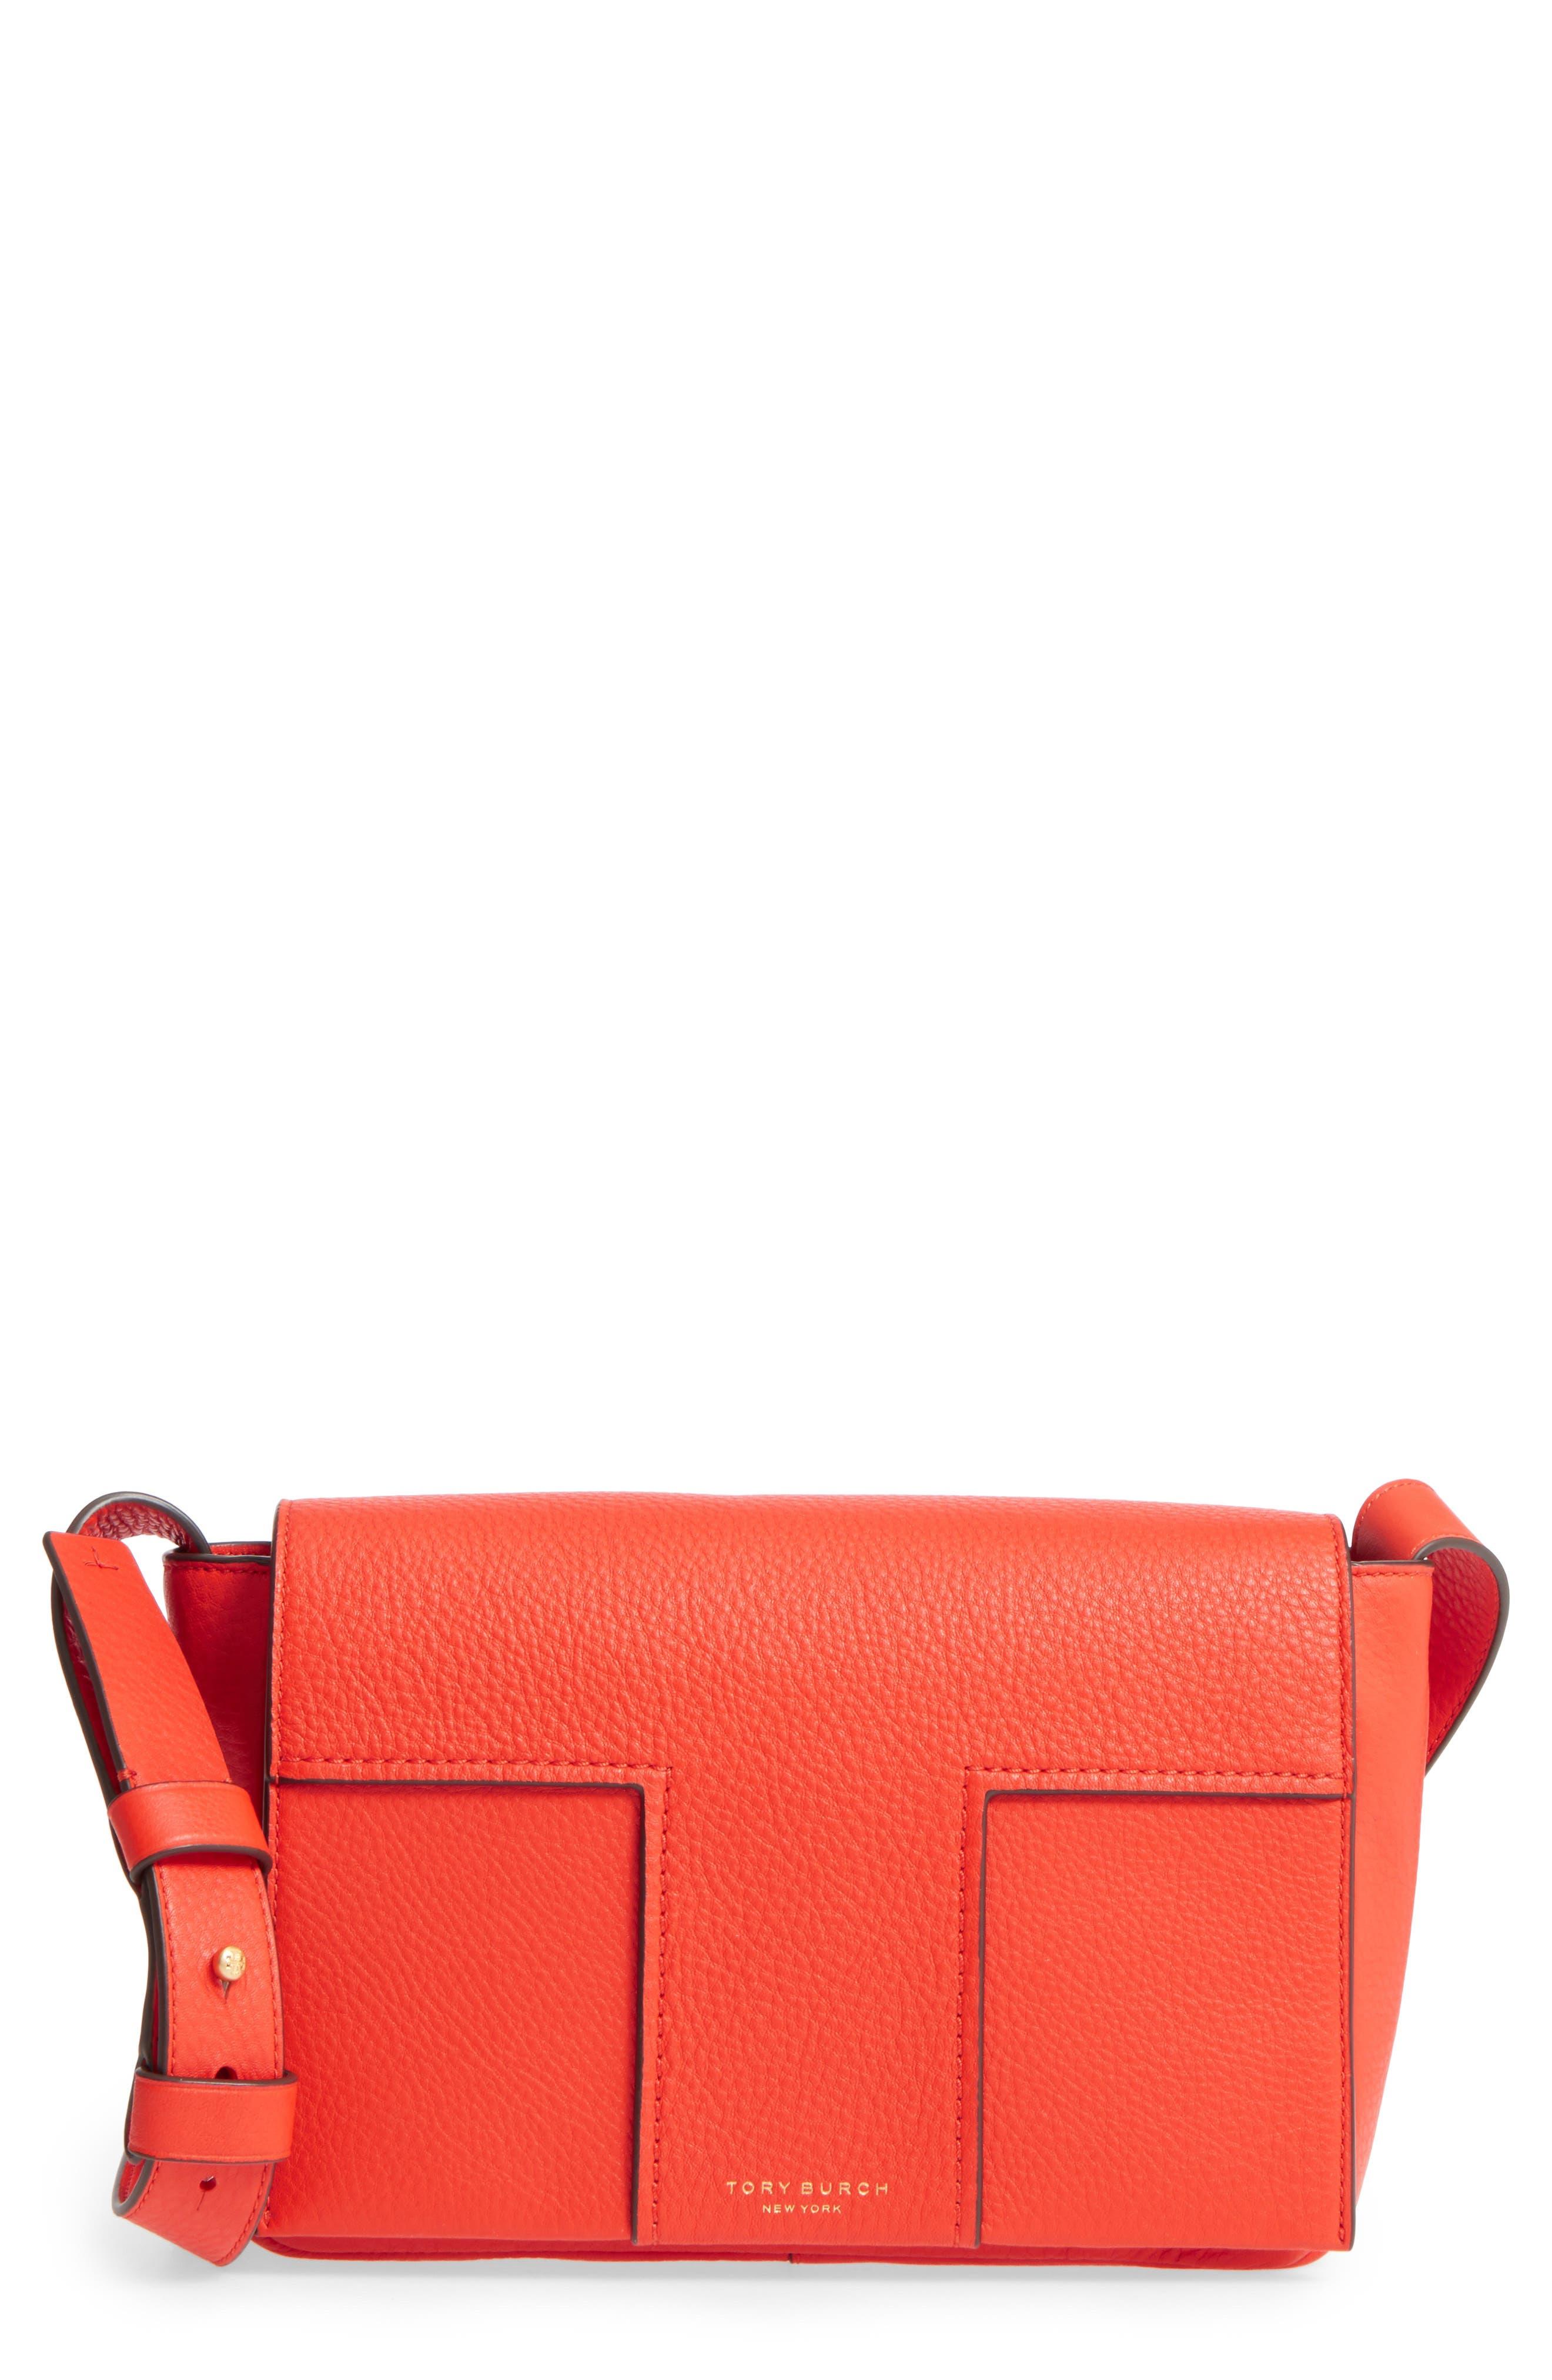 Tory Burch Block-T Pebbled Leather Shoulder Bag